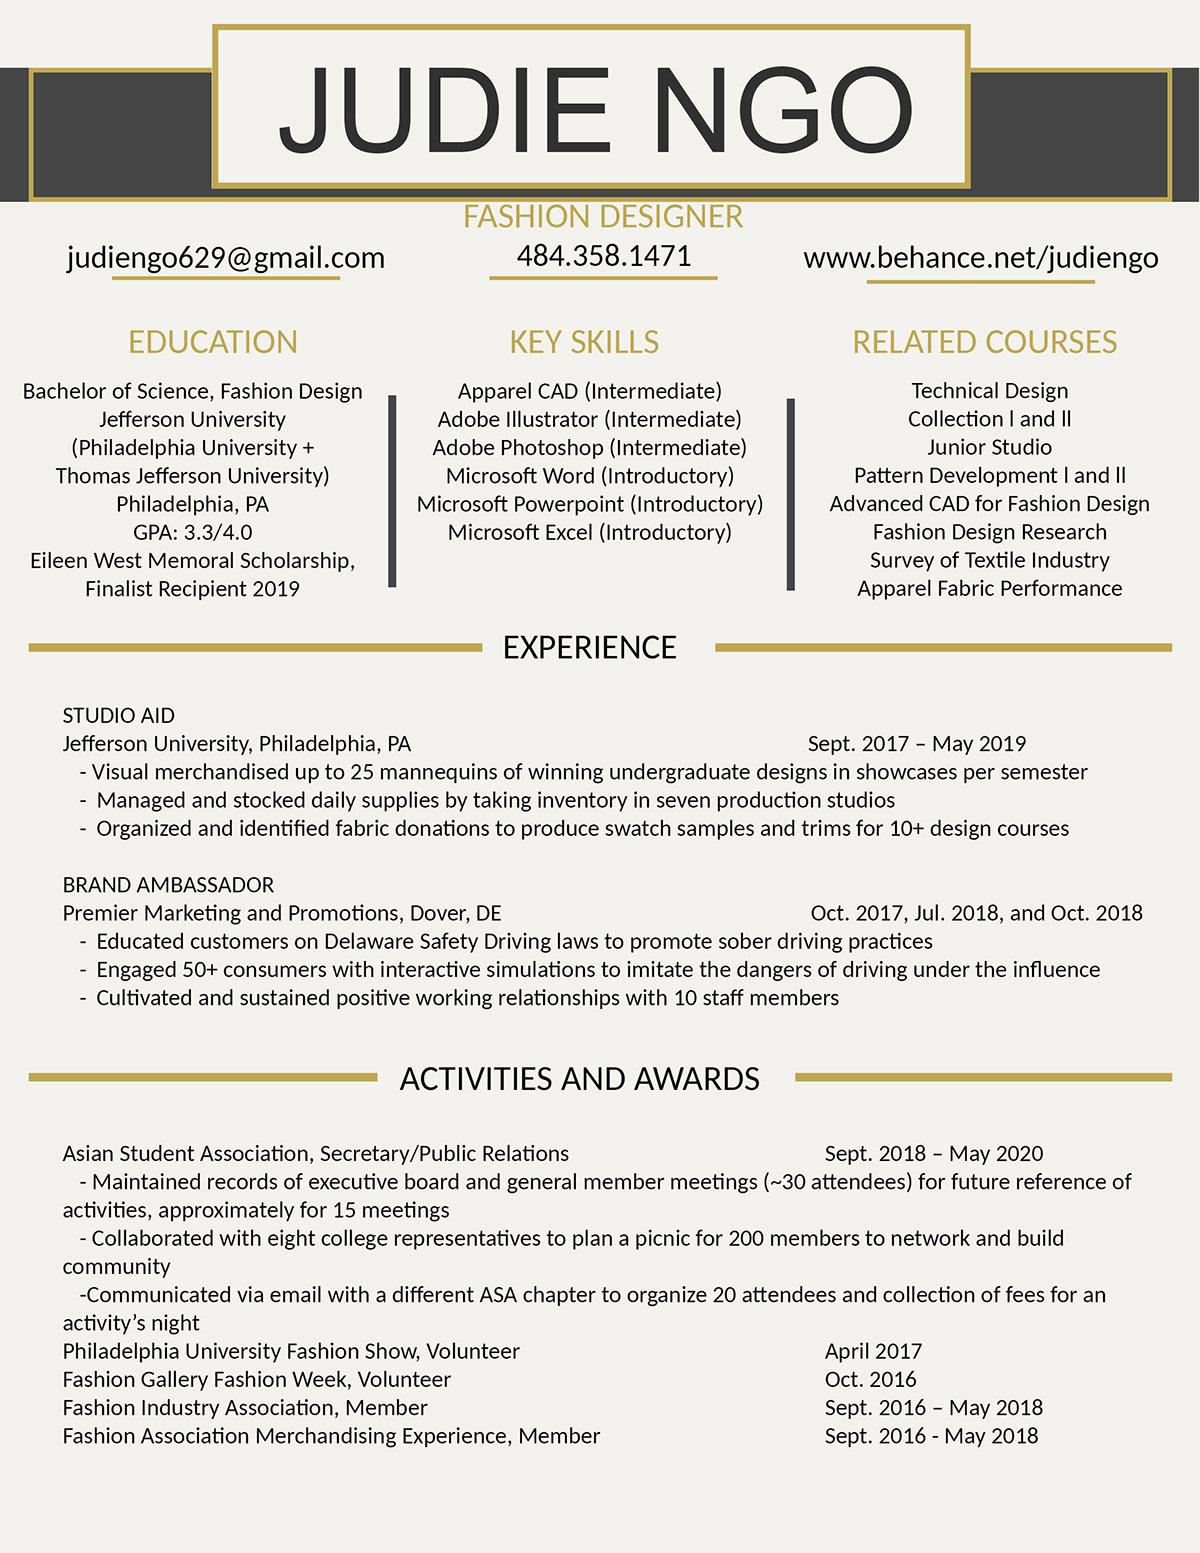 2020 Resume On Philau Portfolios